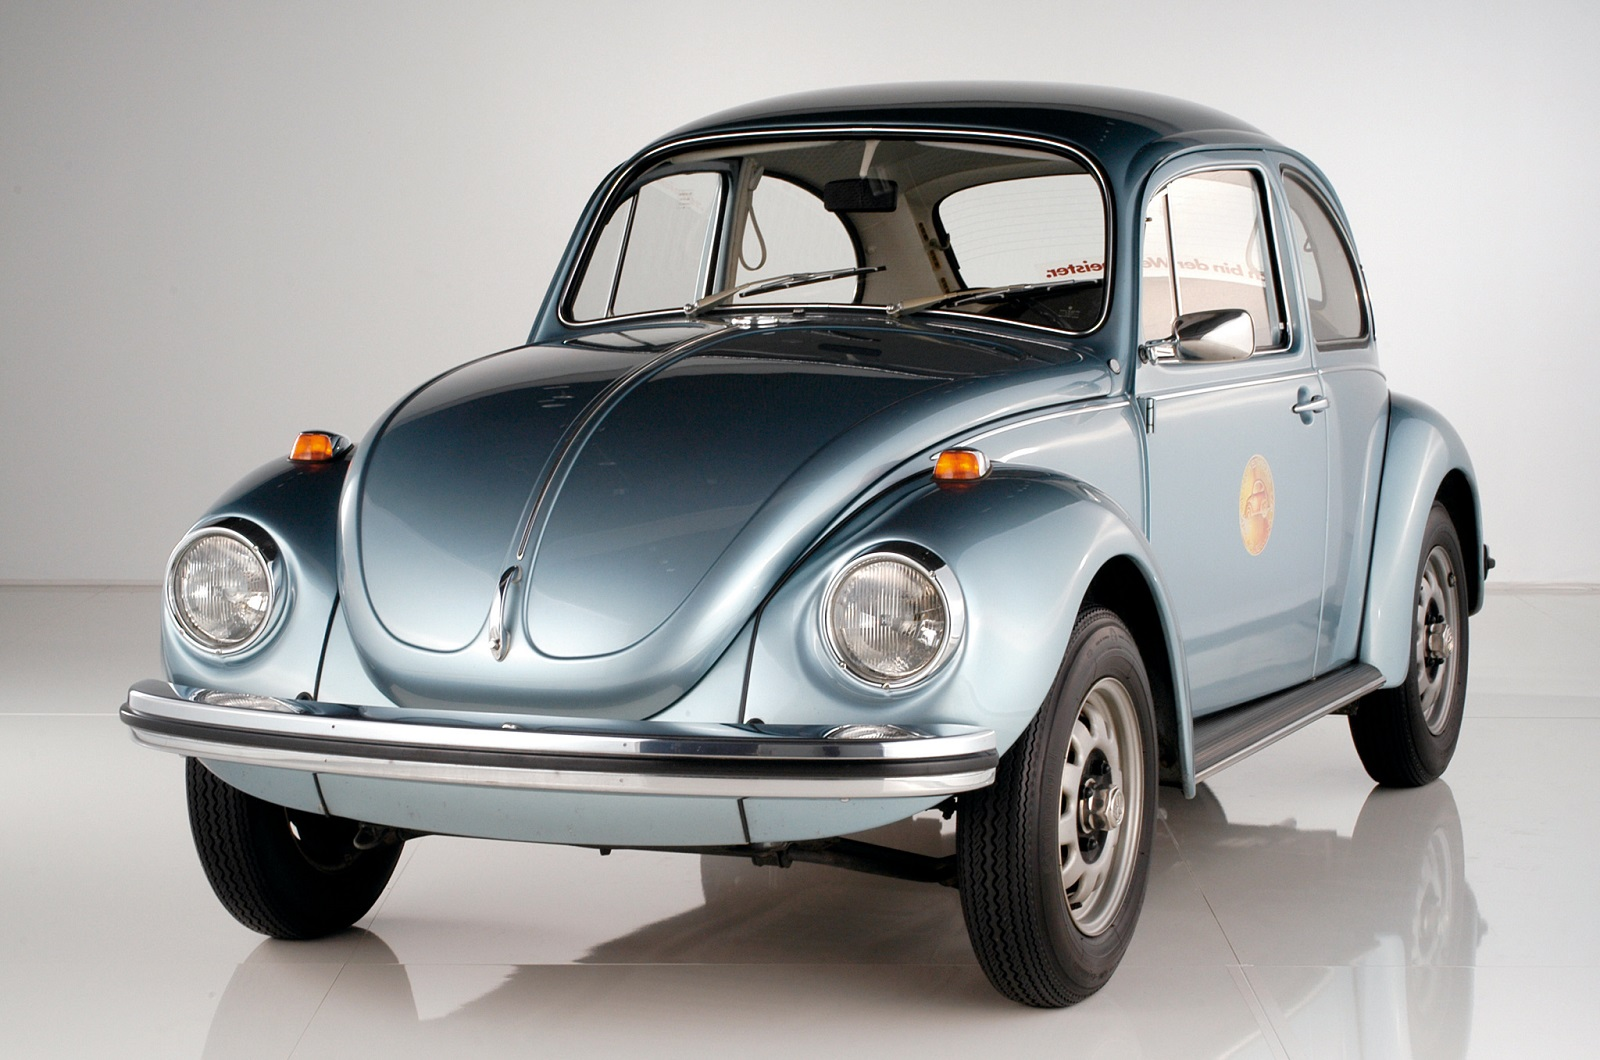 The Vw Beetle Story Autocar